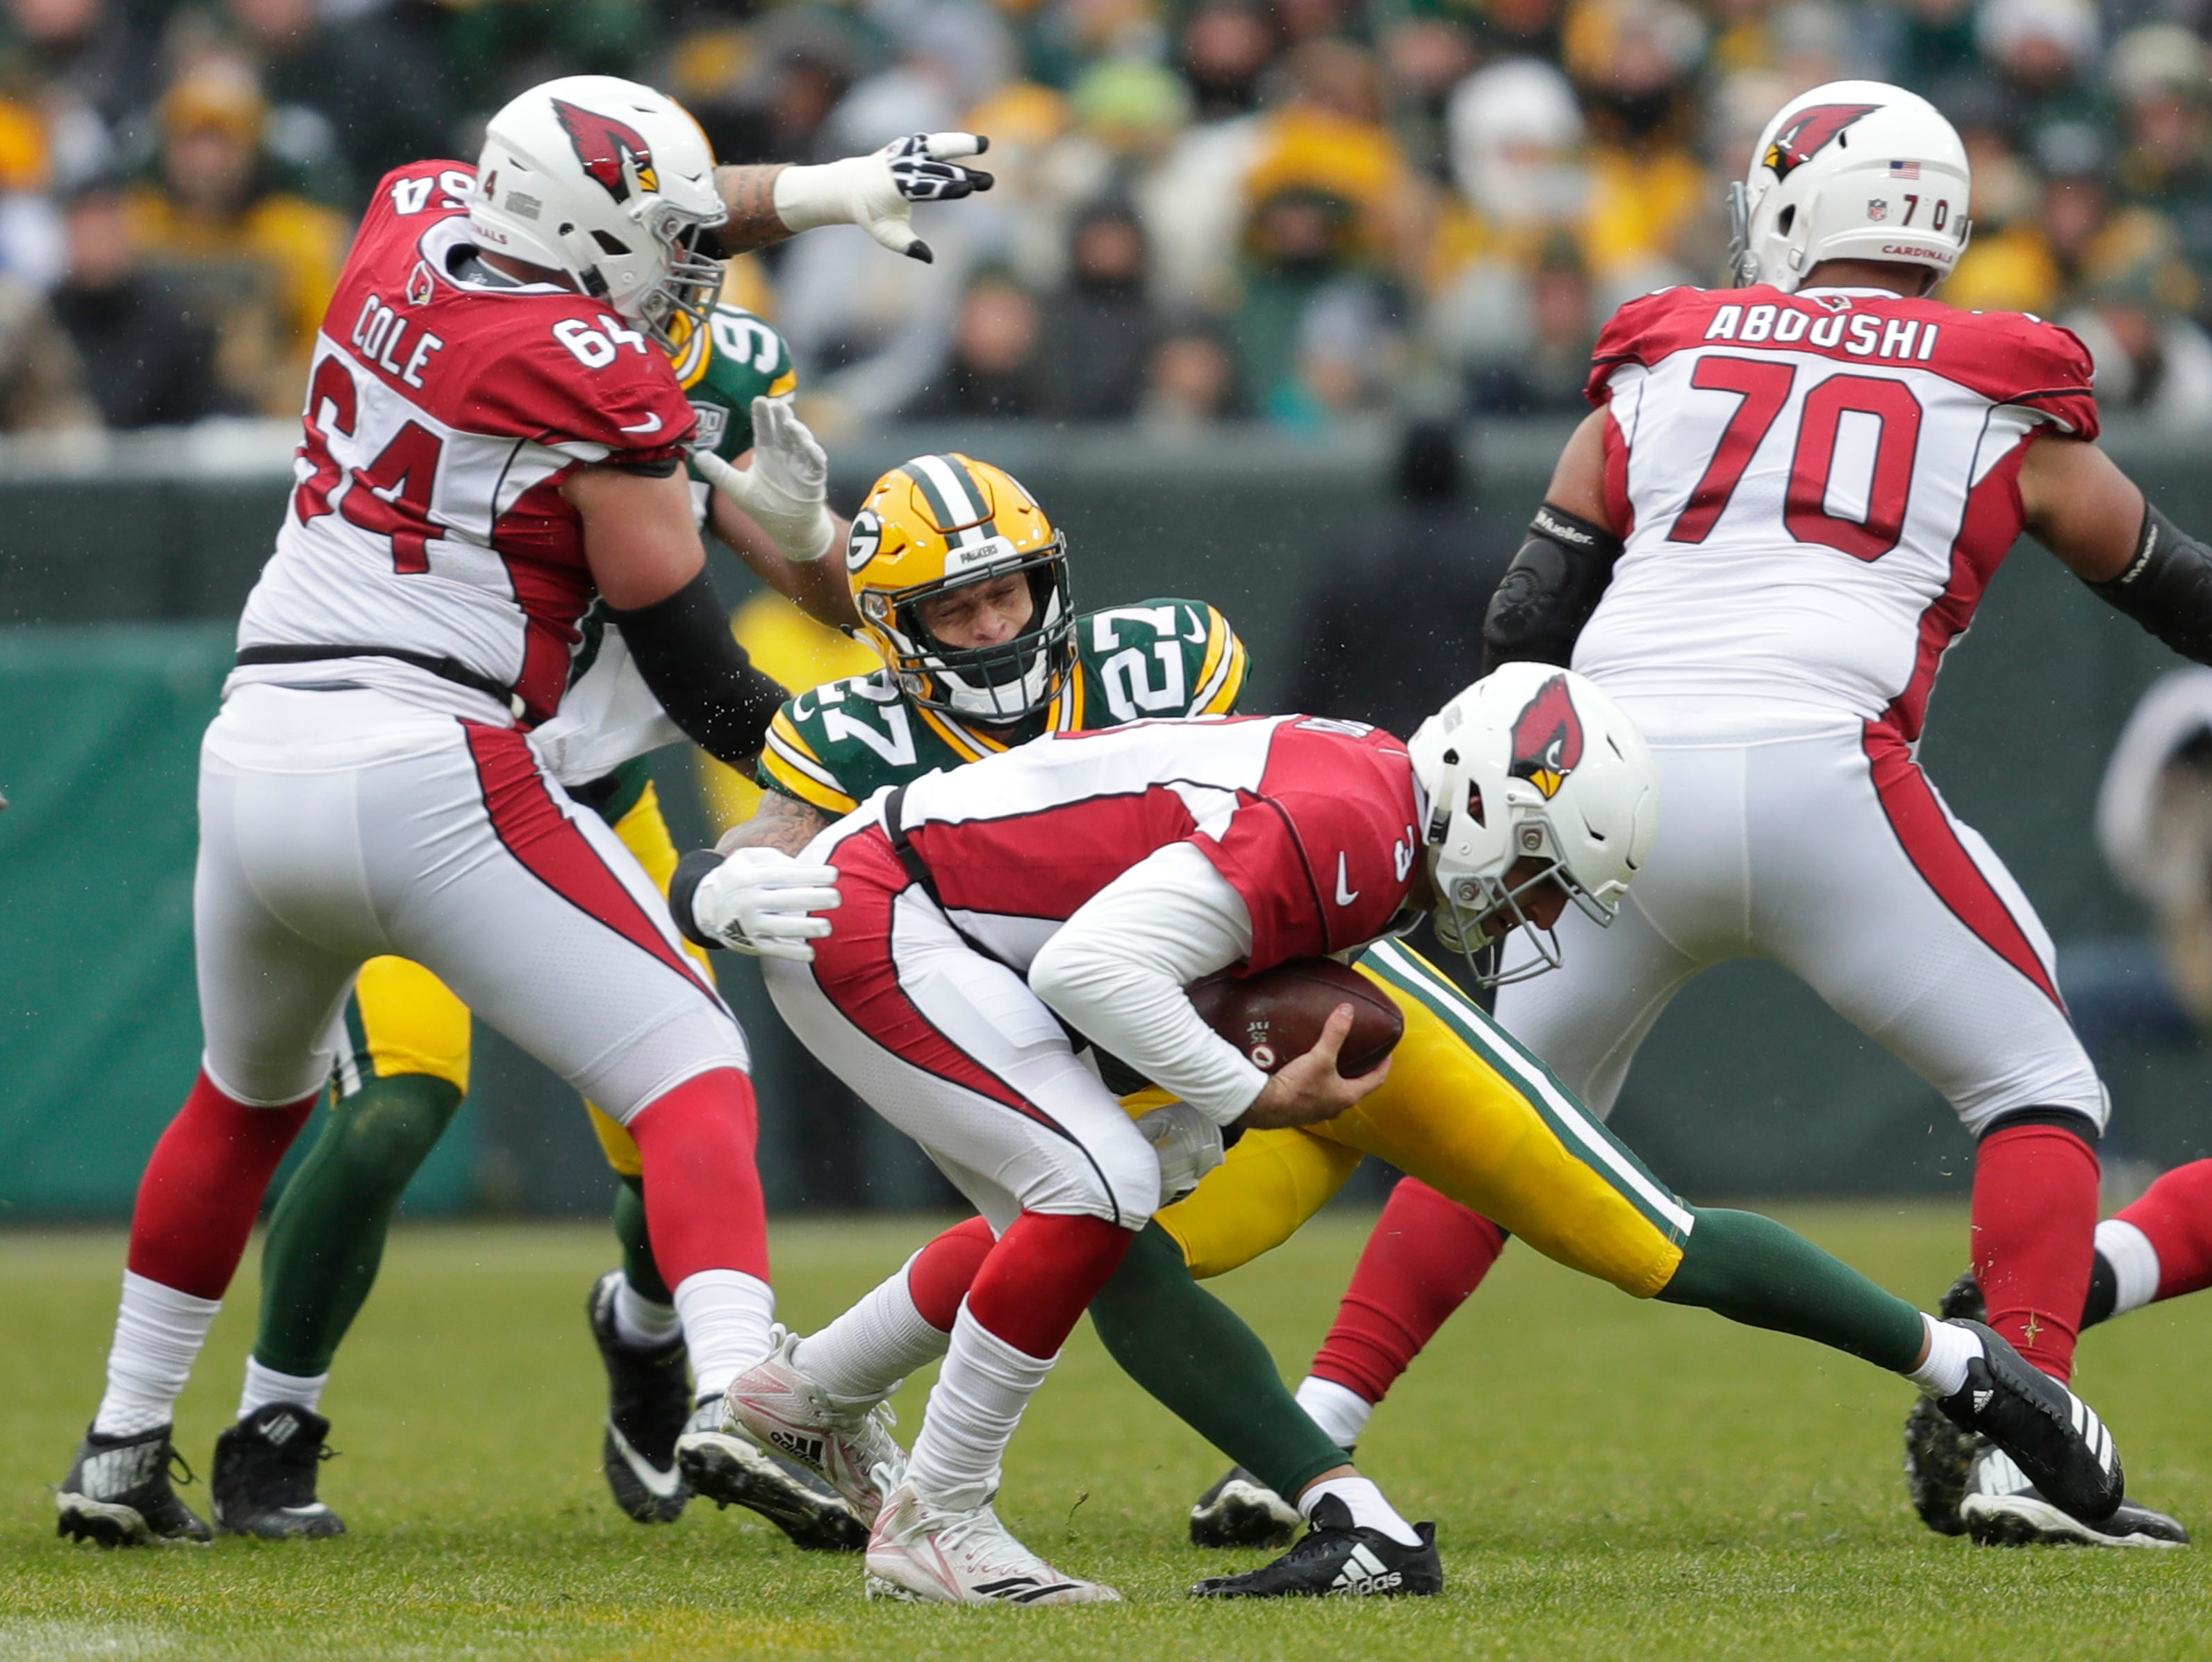 Green Bay Packers defensive back Josh Jones (27) sacks Arizona Cardinals quarterback Josh Rosen (3) in the first quarter Sunday, December 2, 2018, at Lambeau Field in Green Bay, Wis.